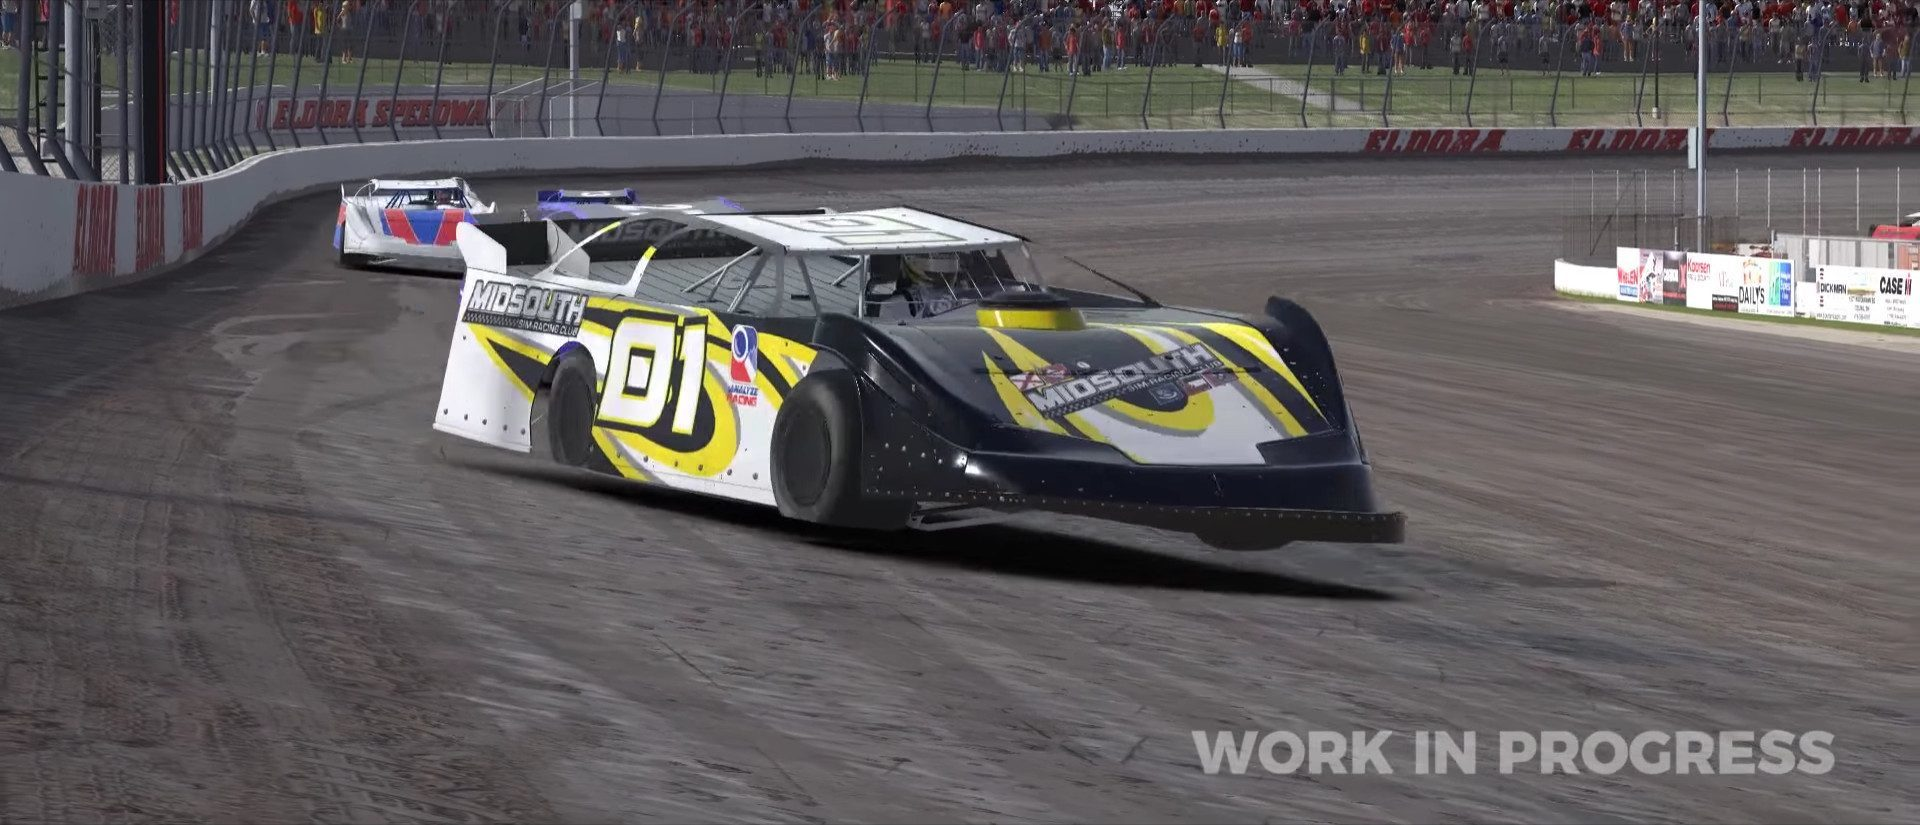 Racing rumors sprint cars autos post for Dirt track race car paint schemes